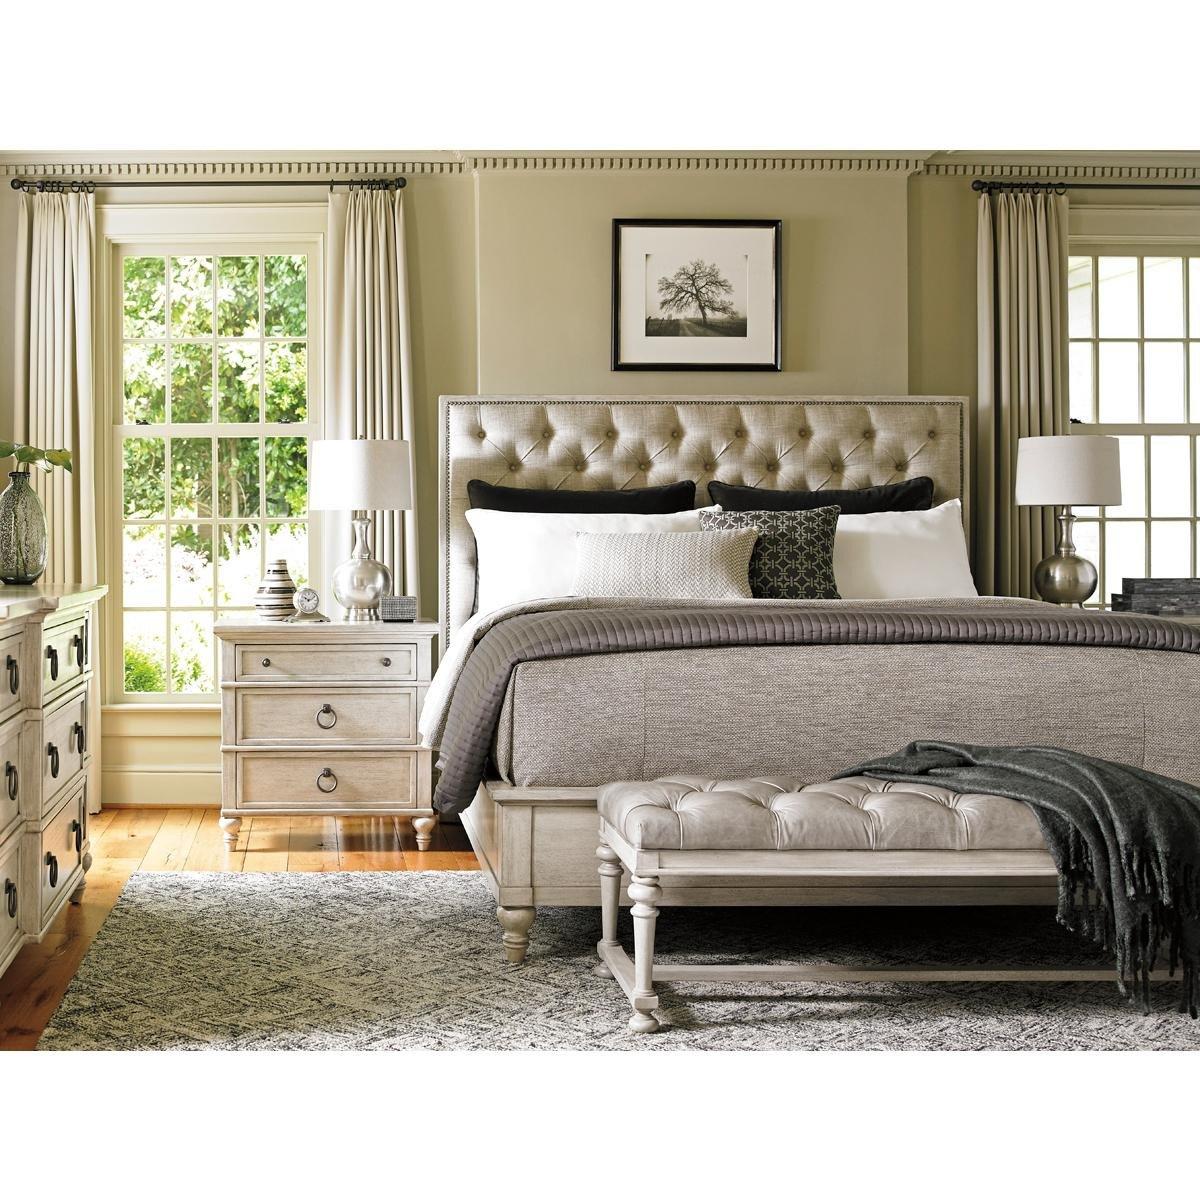 Nebraska Furniture Mart Bedroom Set Lovely Lexington Furniture Oyster Bay Cedarhurst Nightstand In